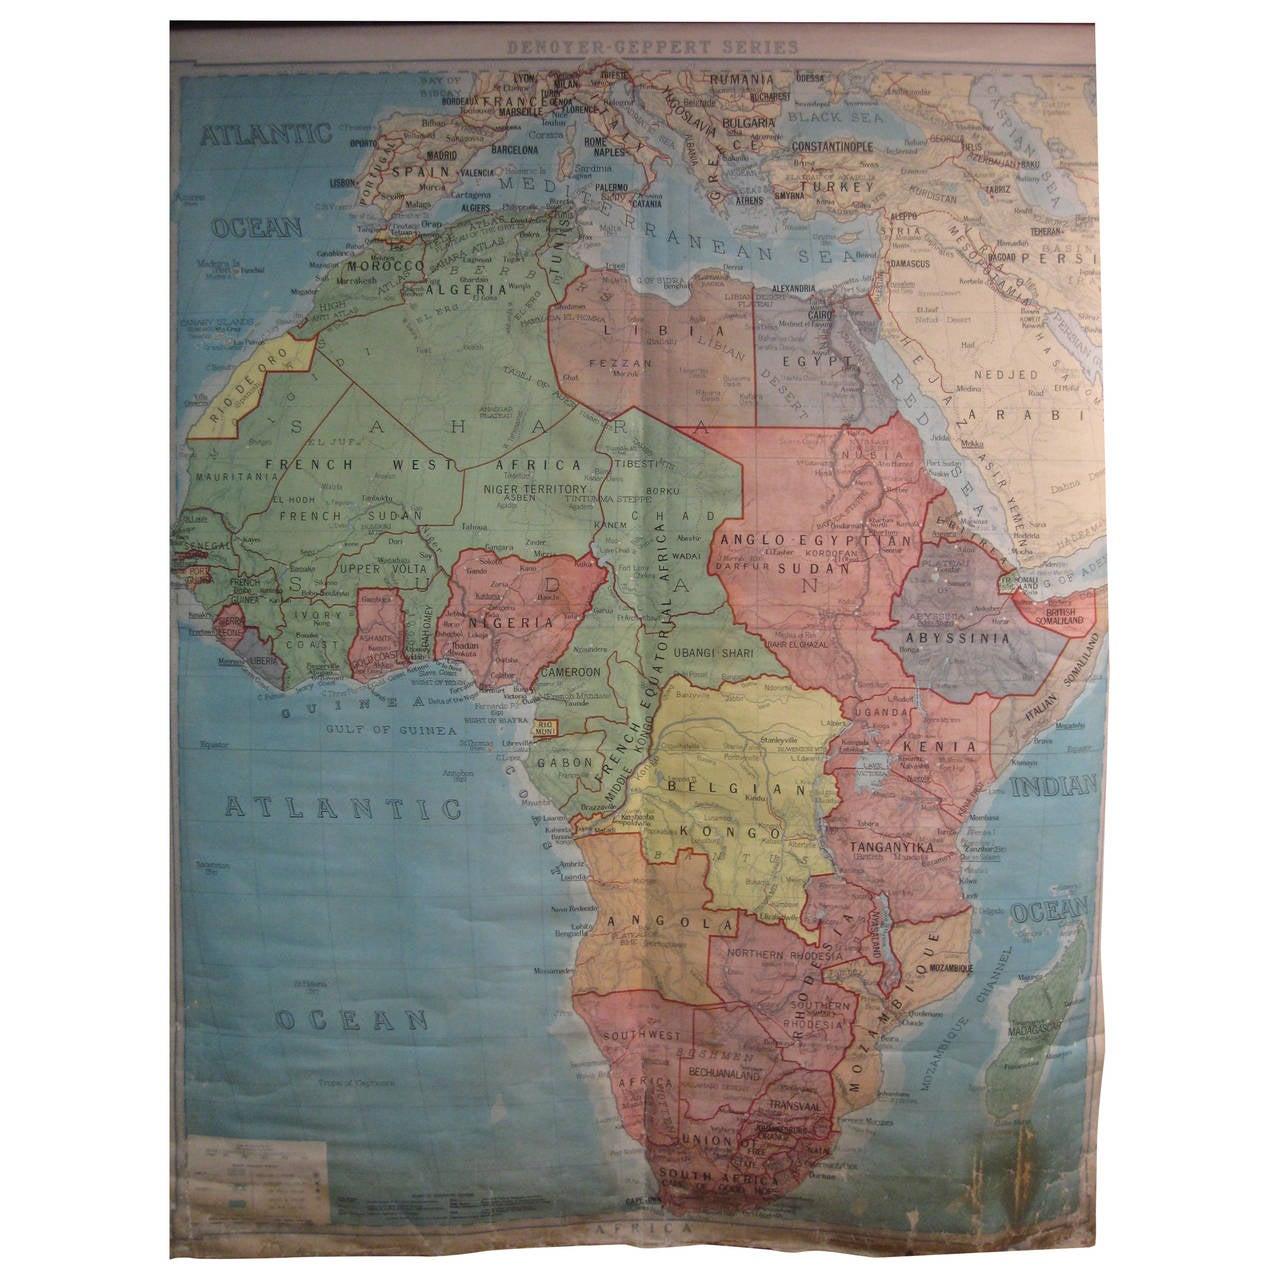 1923 denoyer geppert school house map of africa at 1stdibs